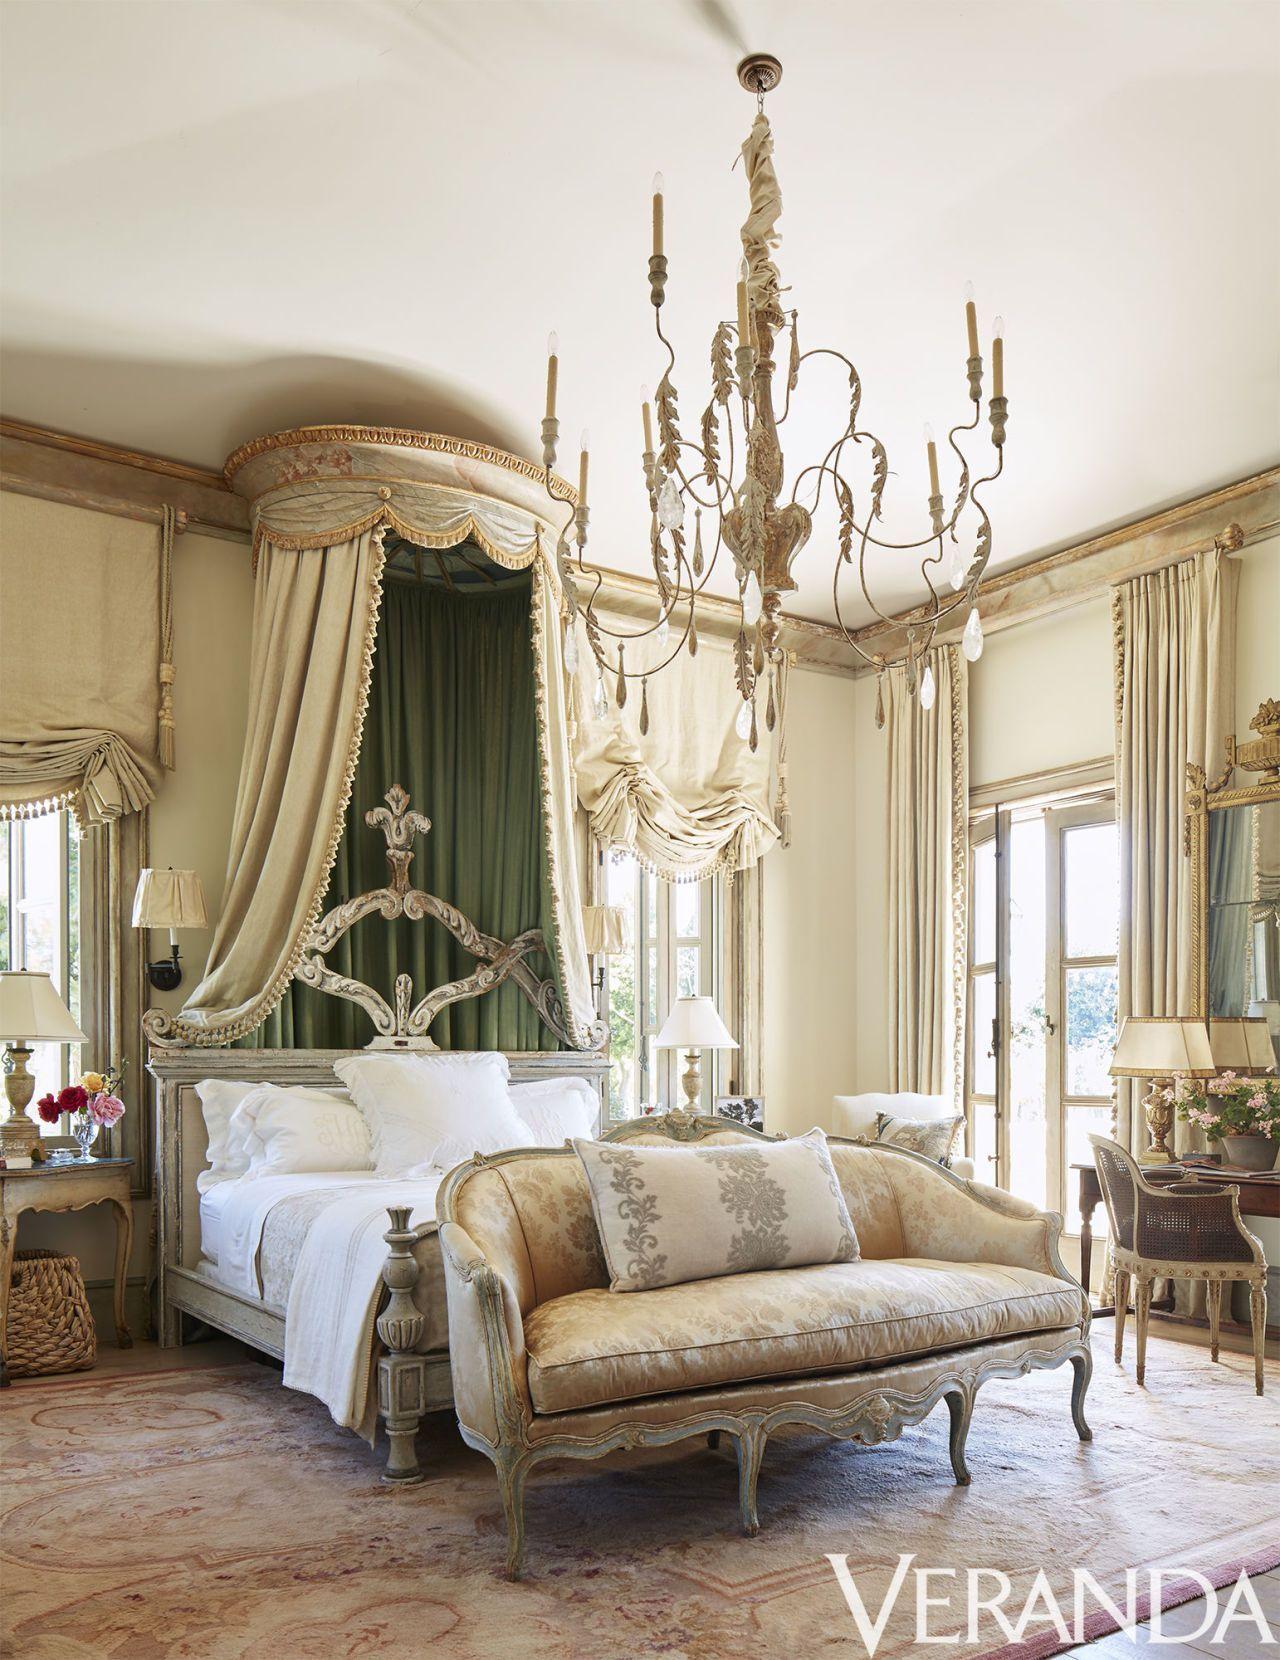 50 Most Beautiful Bedrooms To Inspire Your Next Makeover Elegant Bedroom Luxurious Bedrooms Beautiful Bedroom Decor Most beautiful bedrooms images